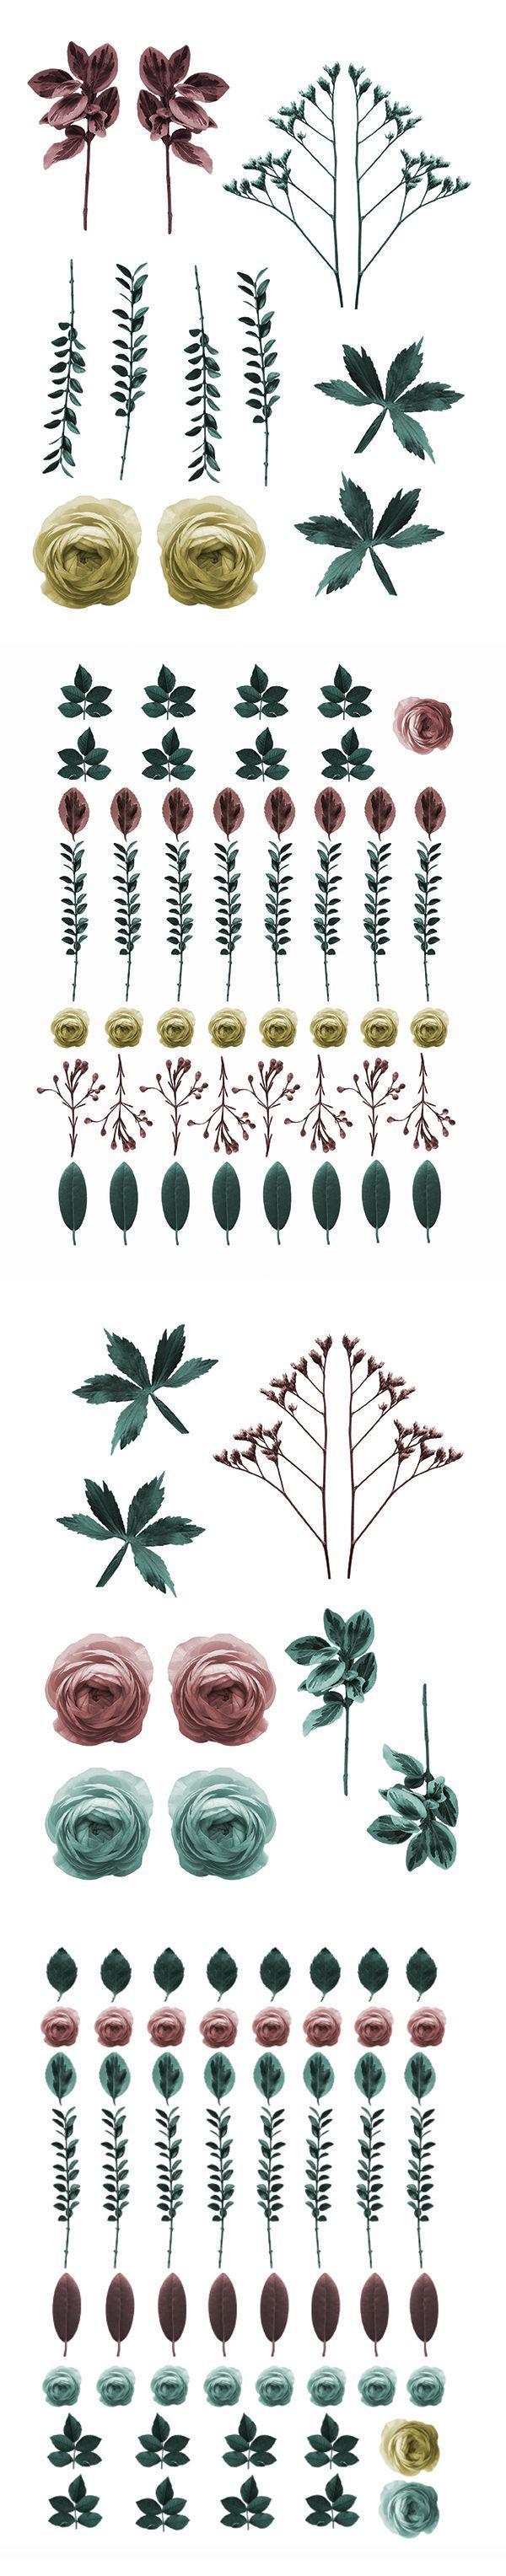 Vintage flowers | Pressed flowers | 70s crafts | desktop wallpapers | Mobile wallpapers